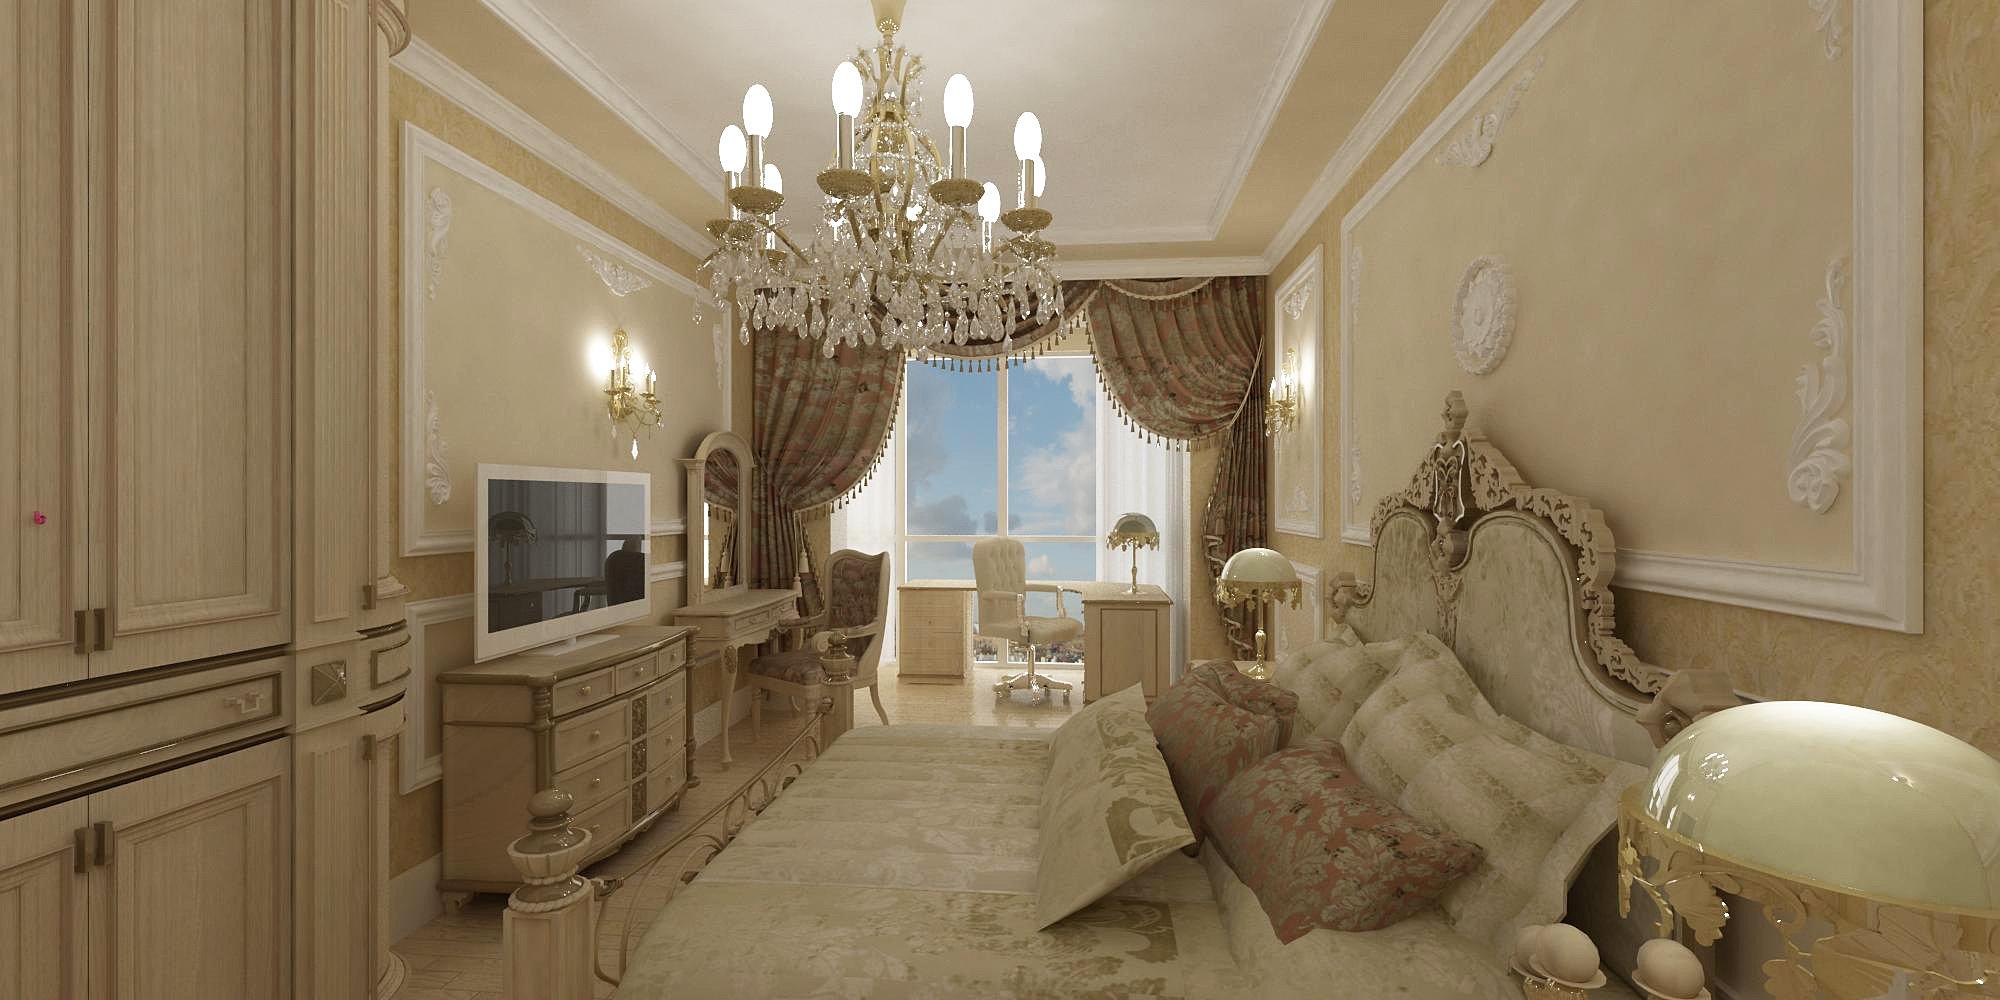 Ремонт в стиле барокко фото